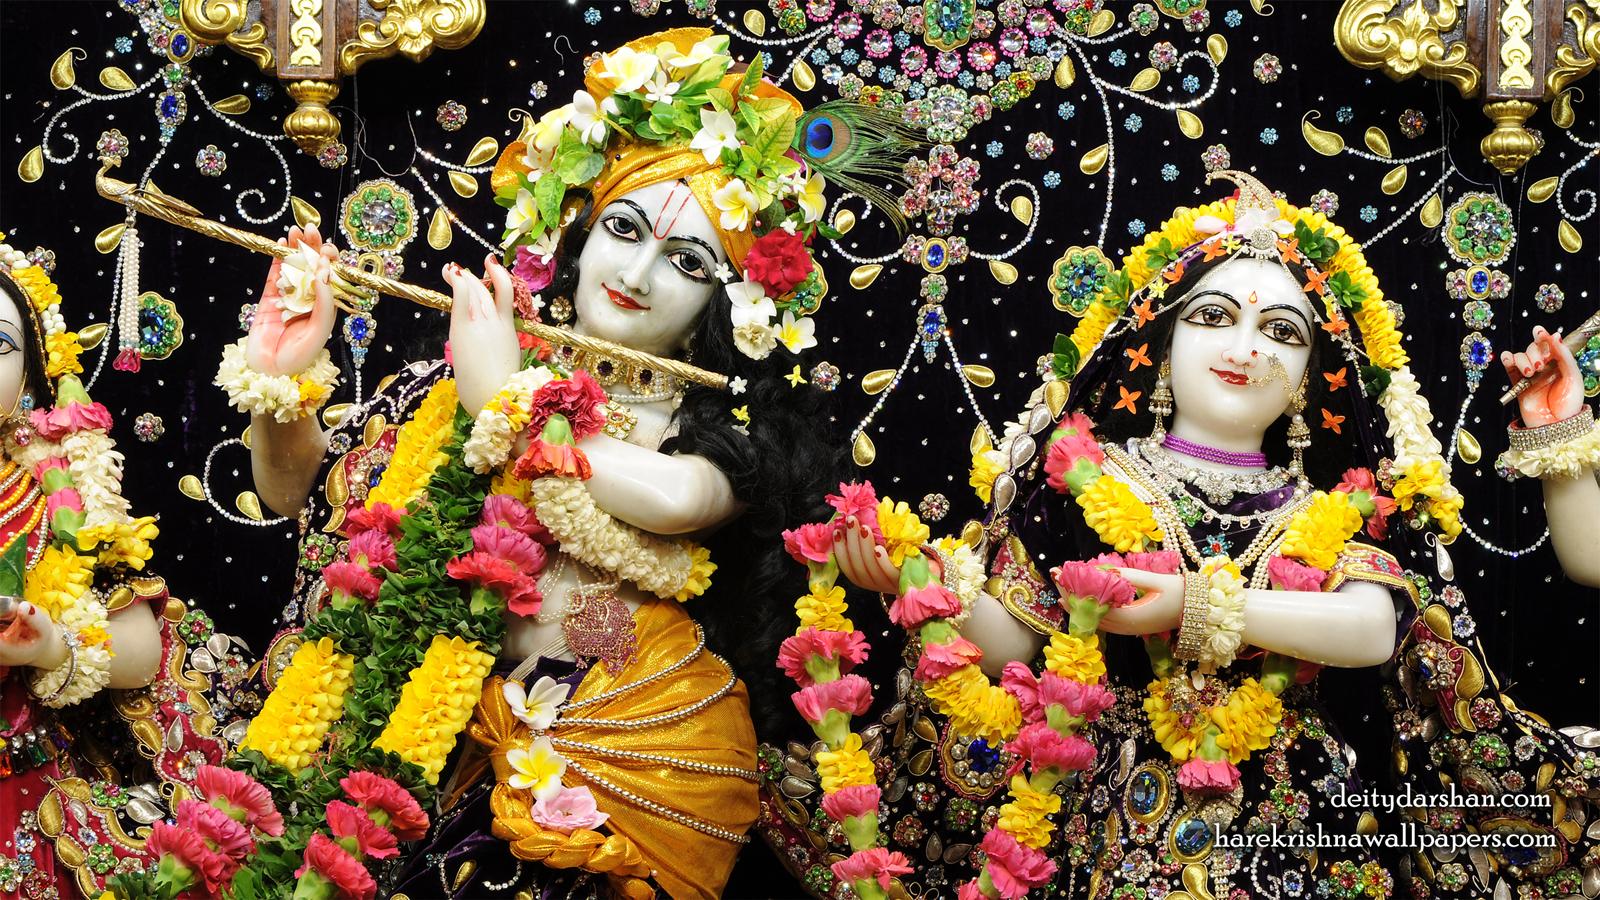 Sri Sri Radha Gopinath Close up Wallpaper (058) Size 1600x900 Download